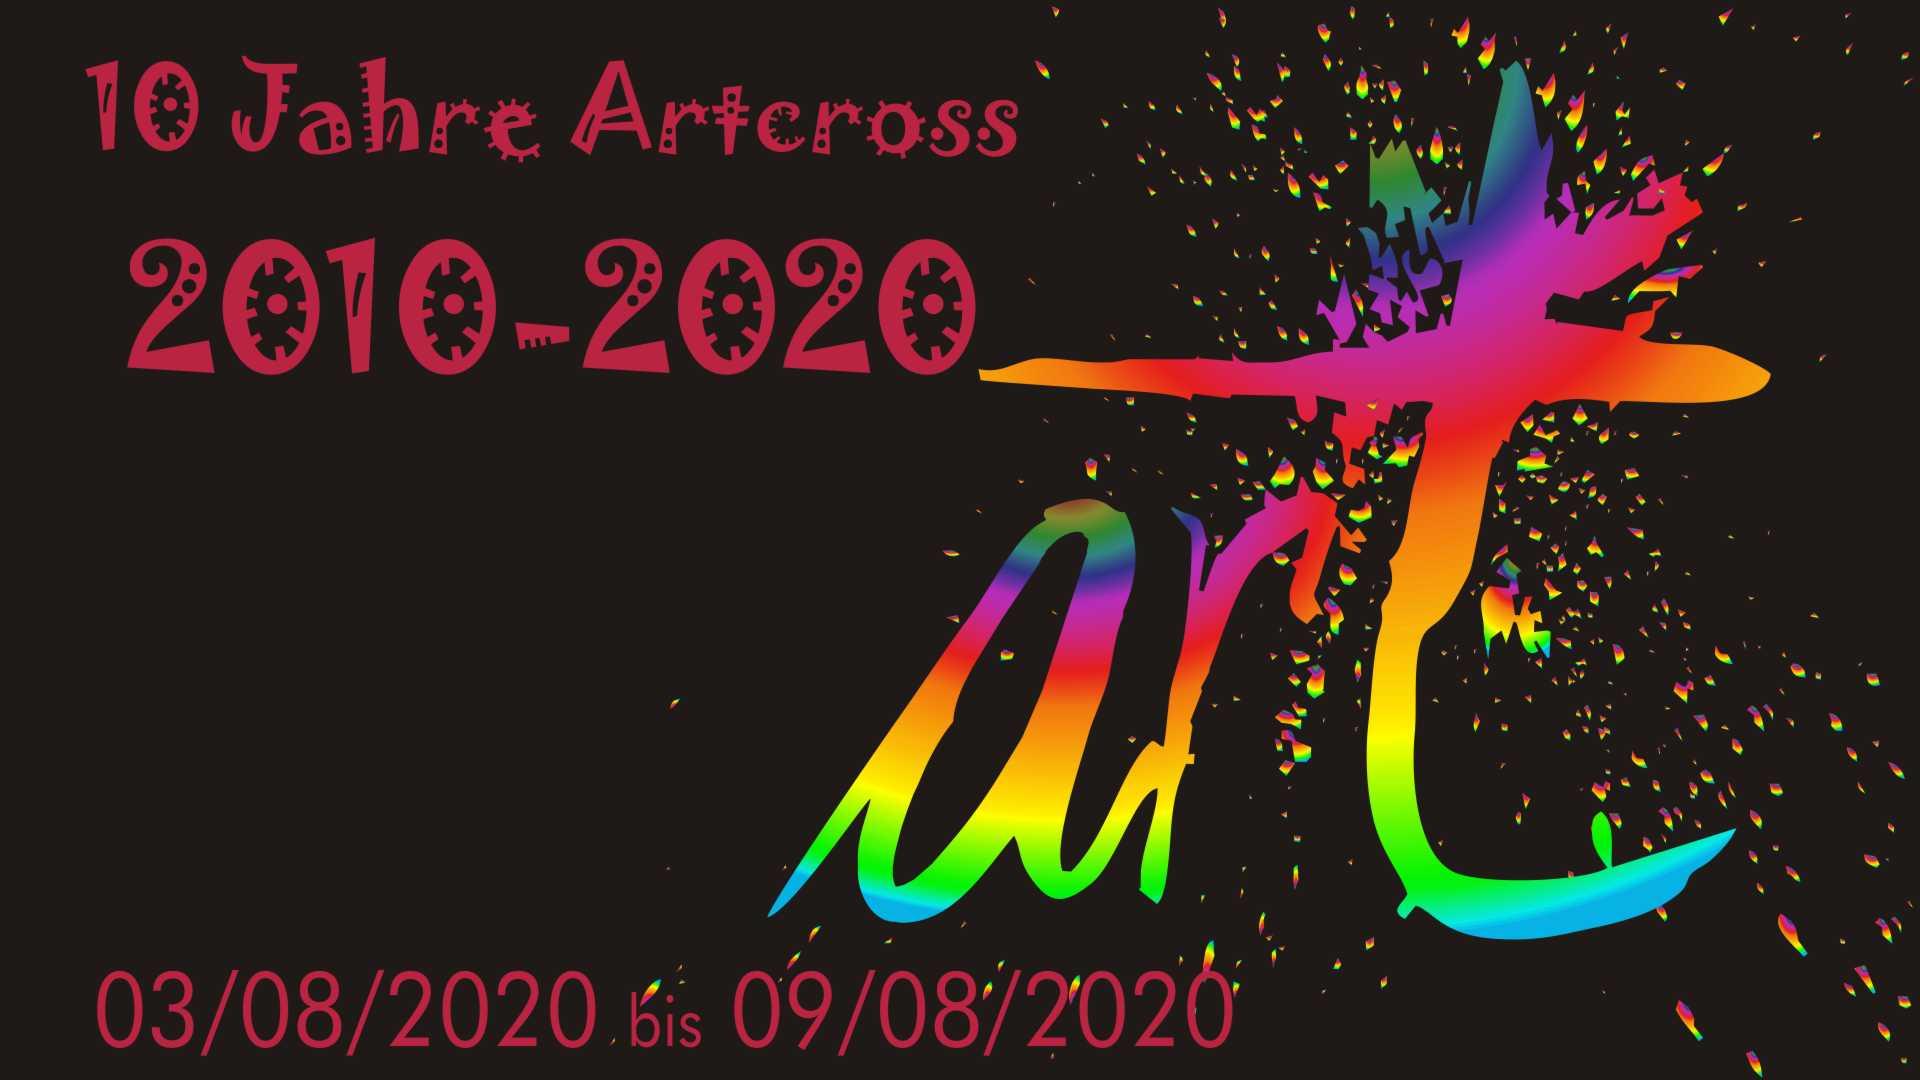 Artcross